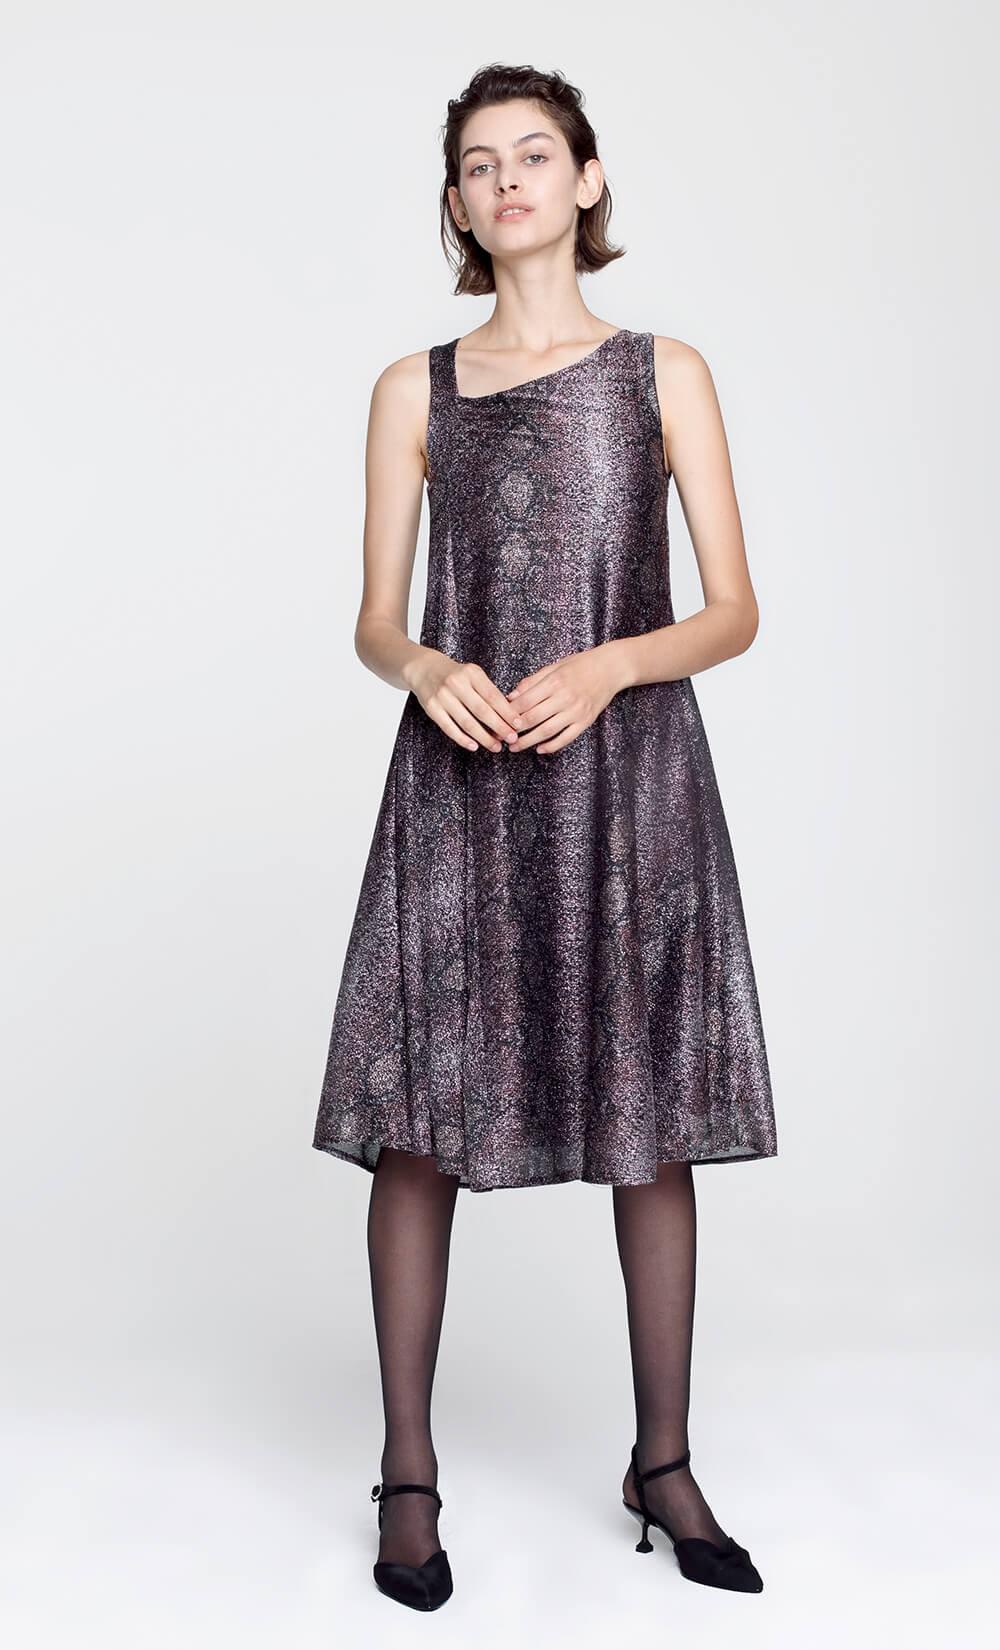 Solista Dress